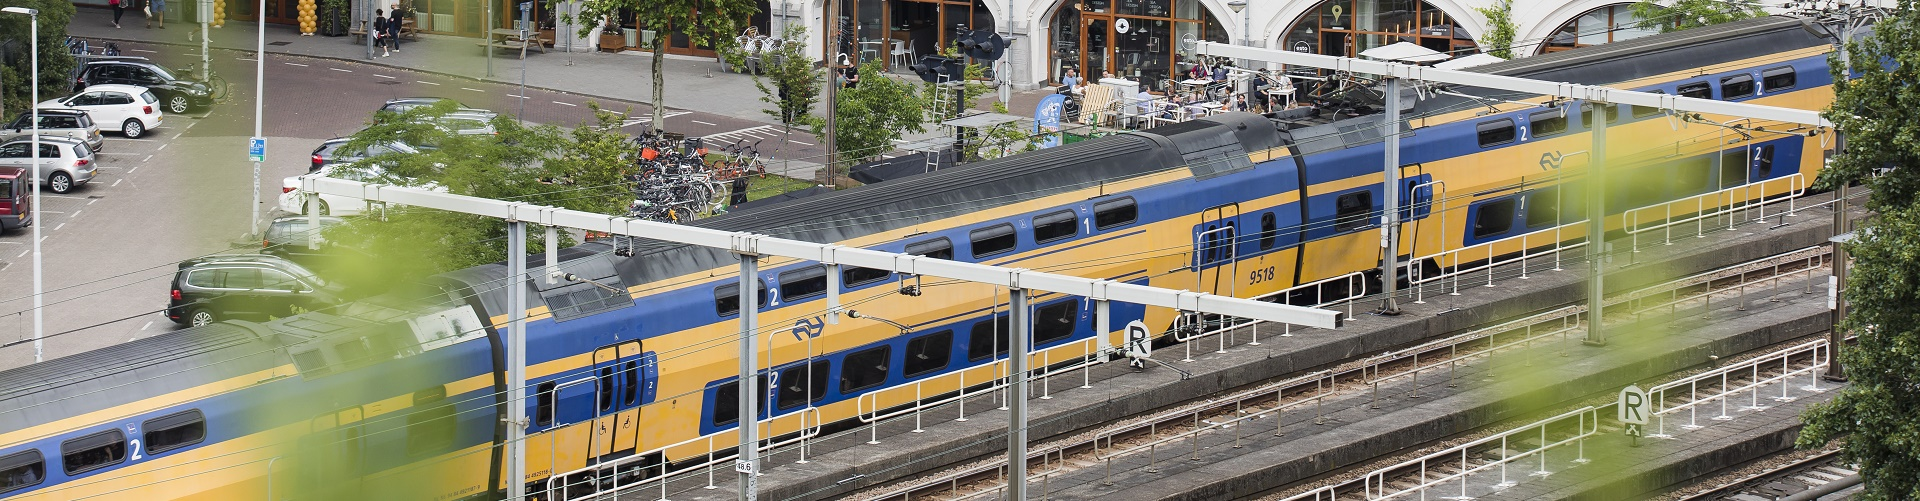 Minder openbaar vervoer in Rotterdam